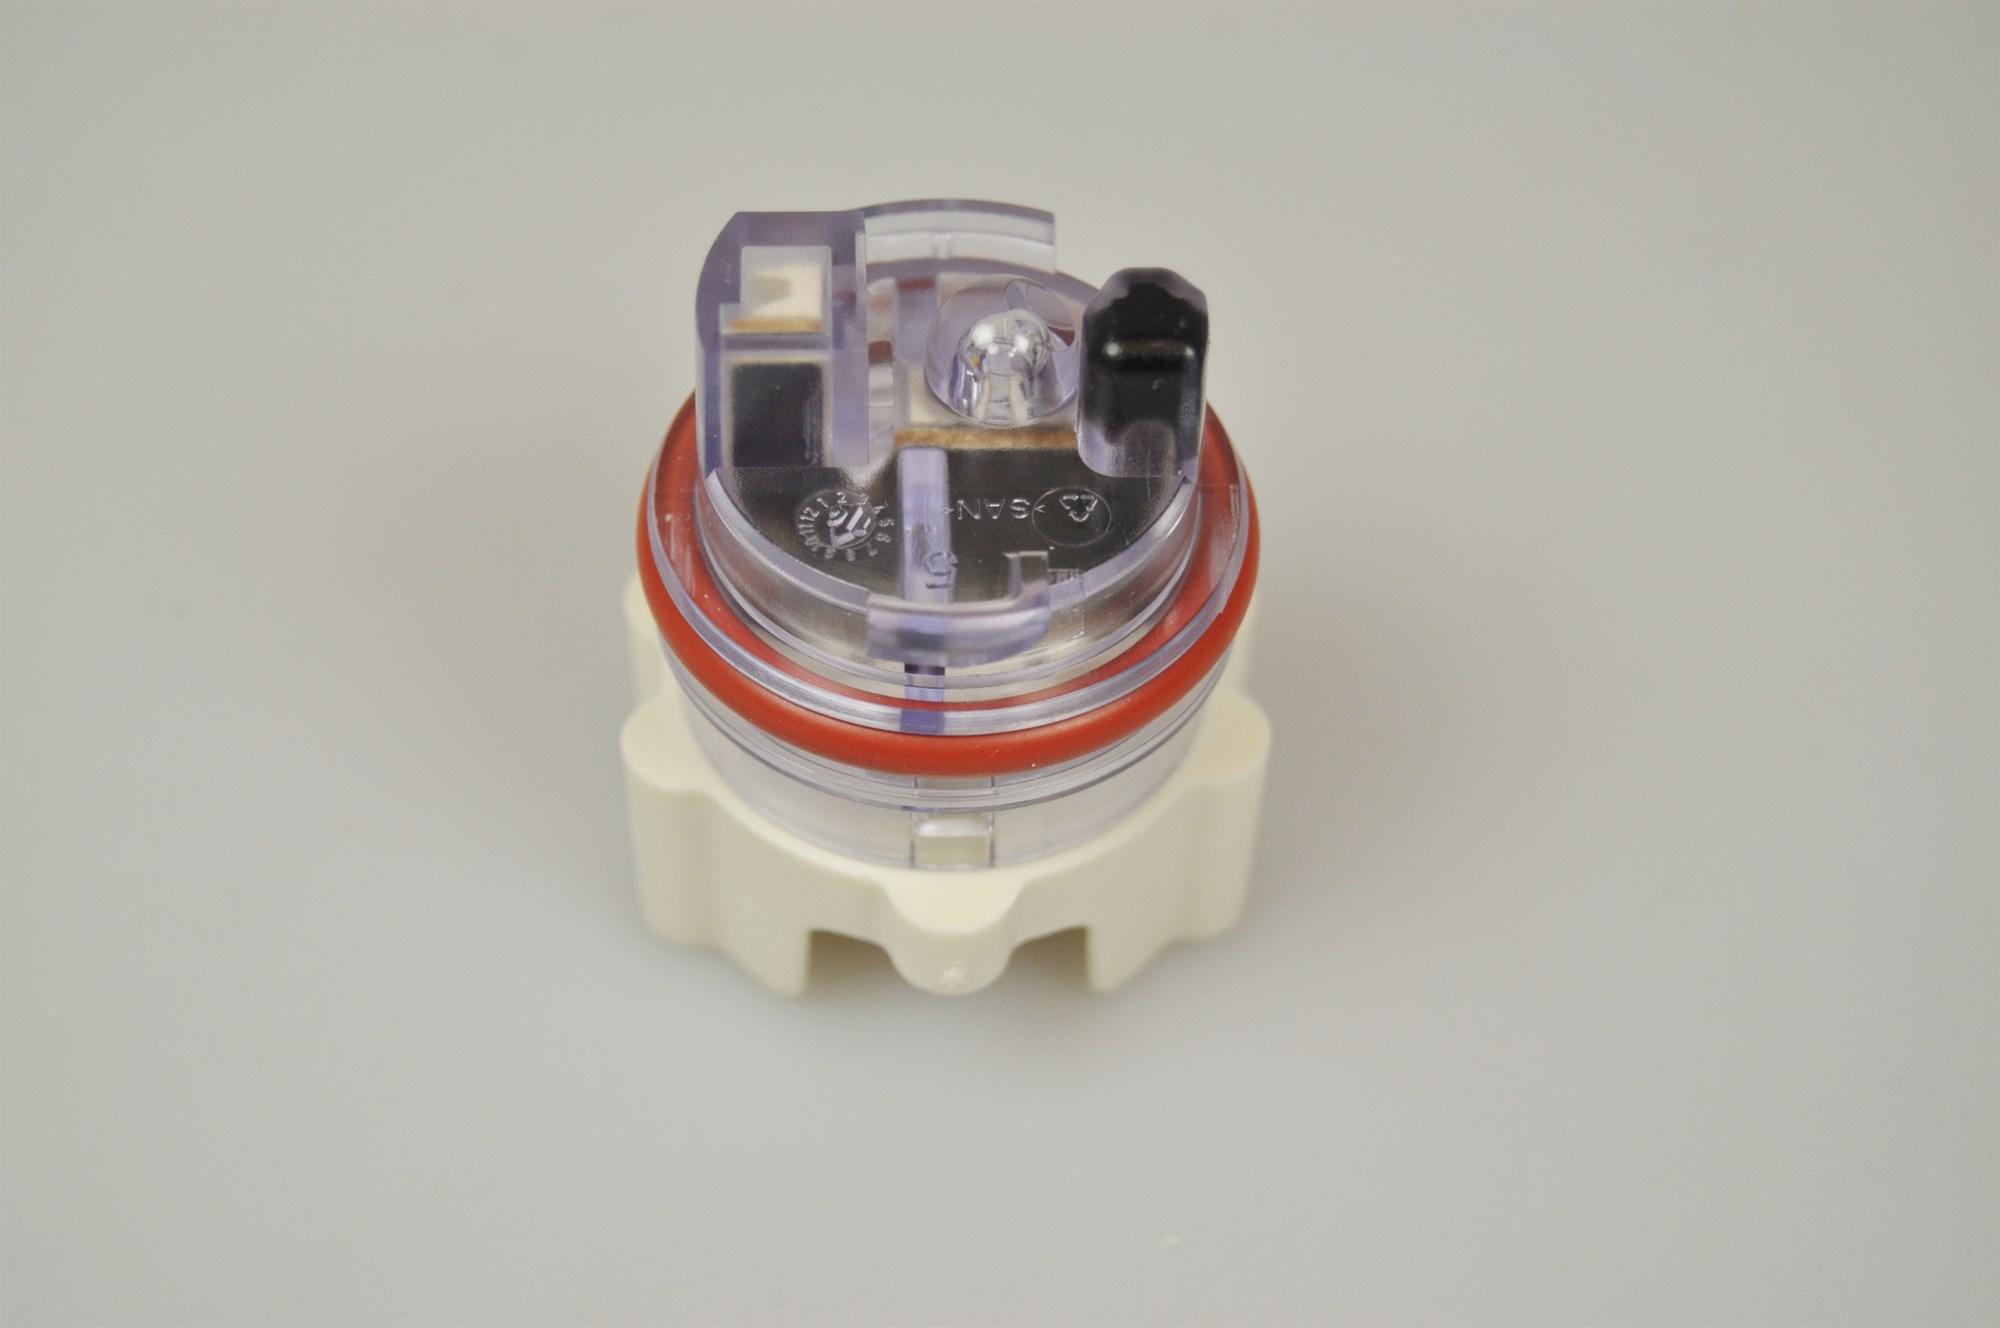 Level Switch Whirlpool Dishwasher